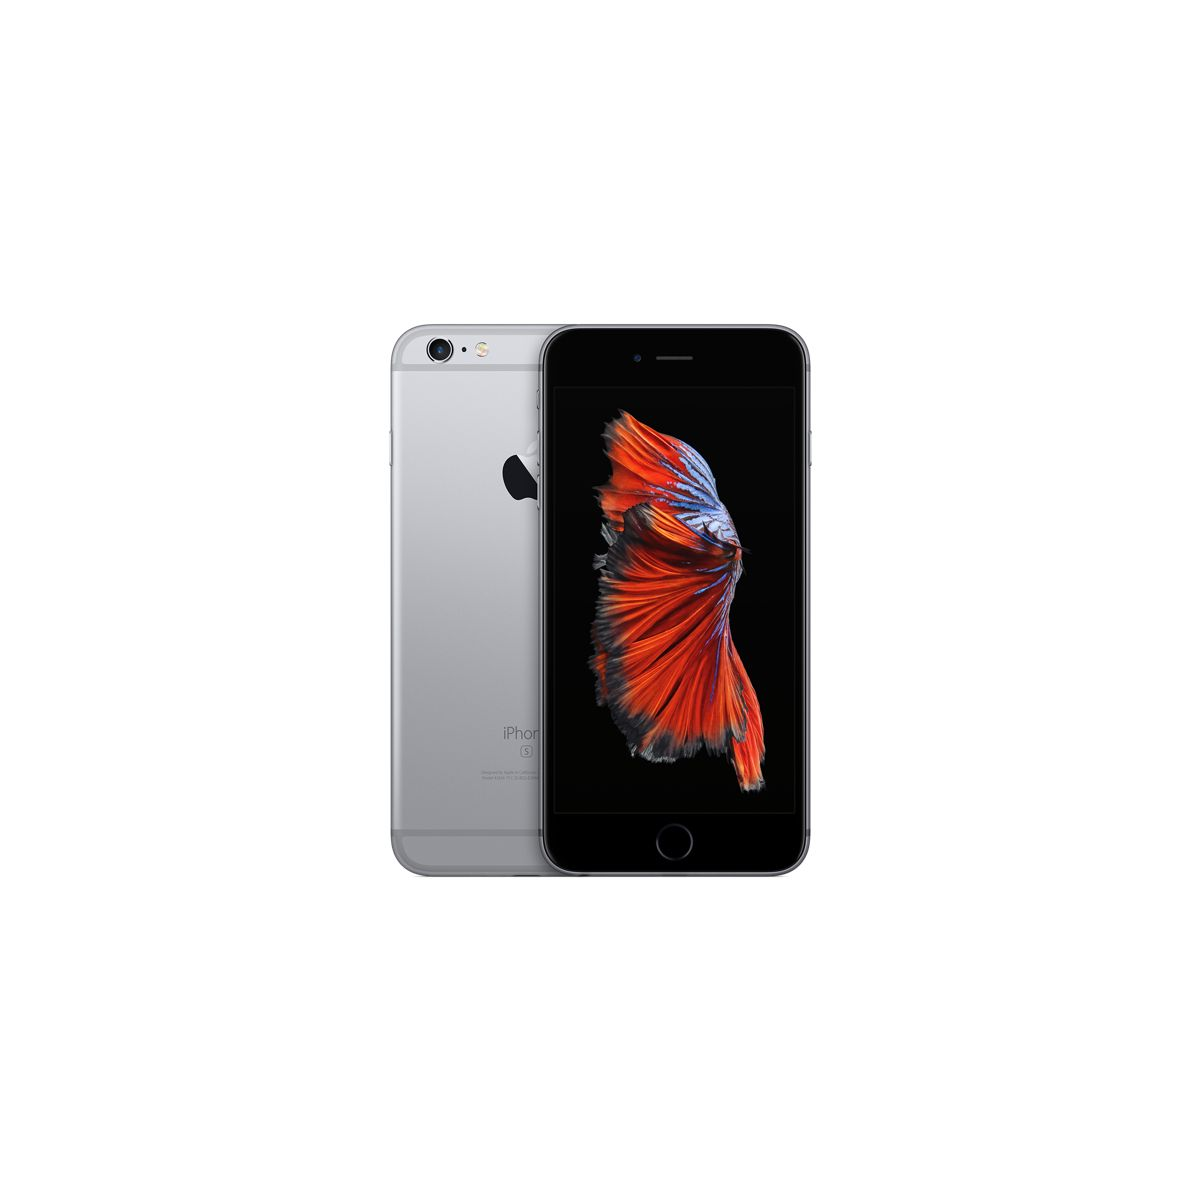 APPLE iPhone 6S Plus 16Go Gris sidéral (photo)